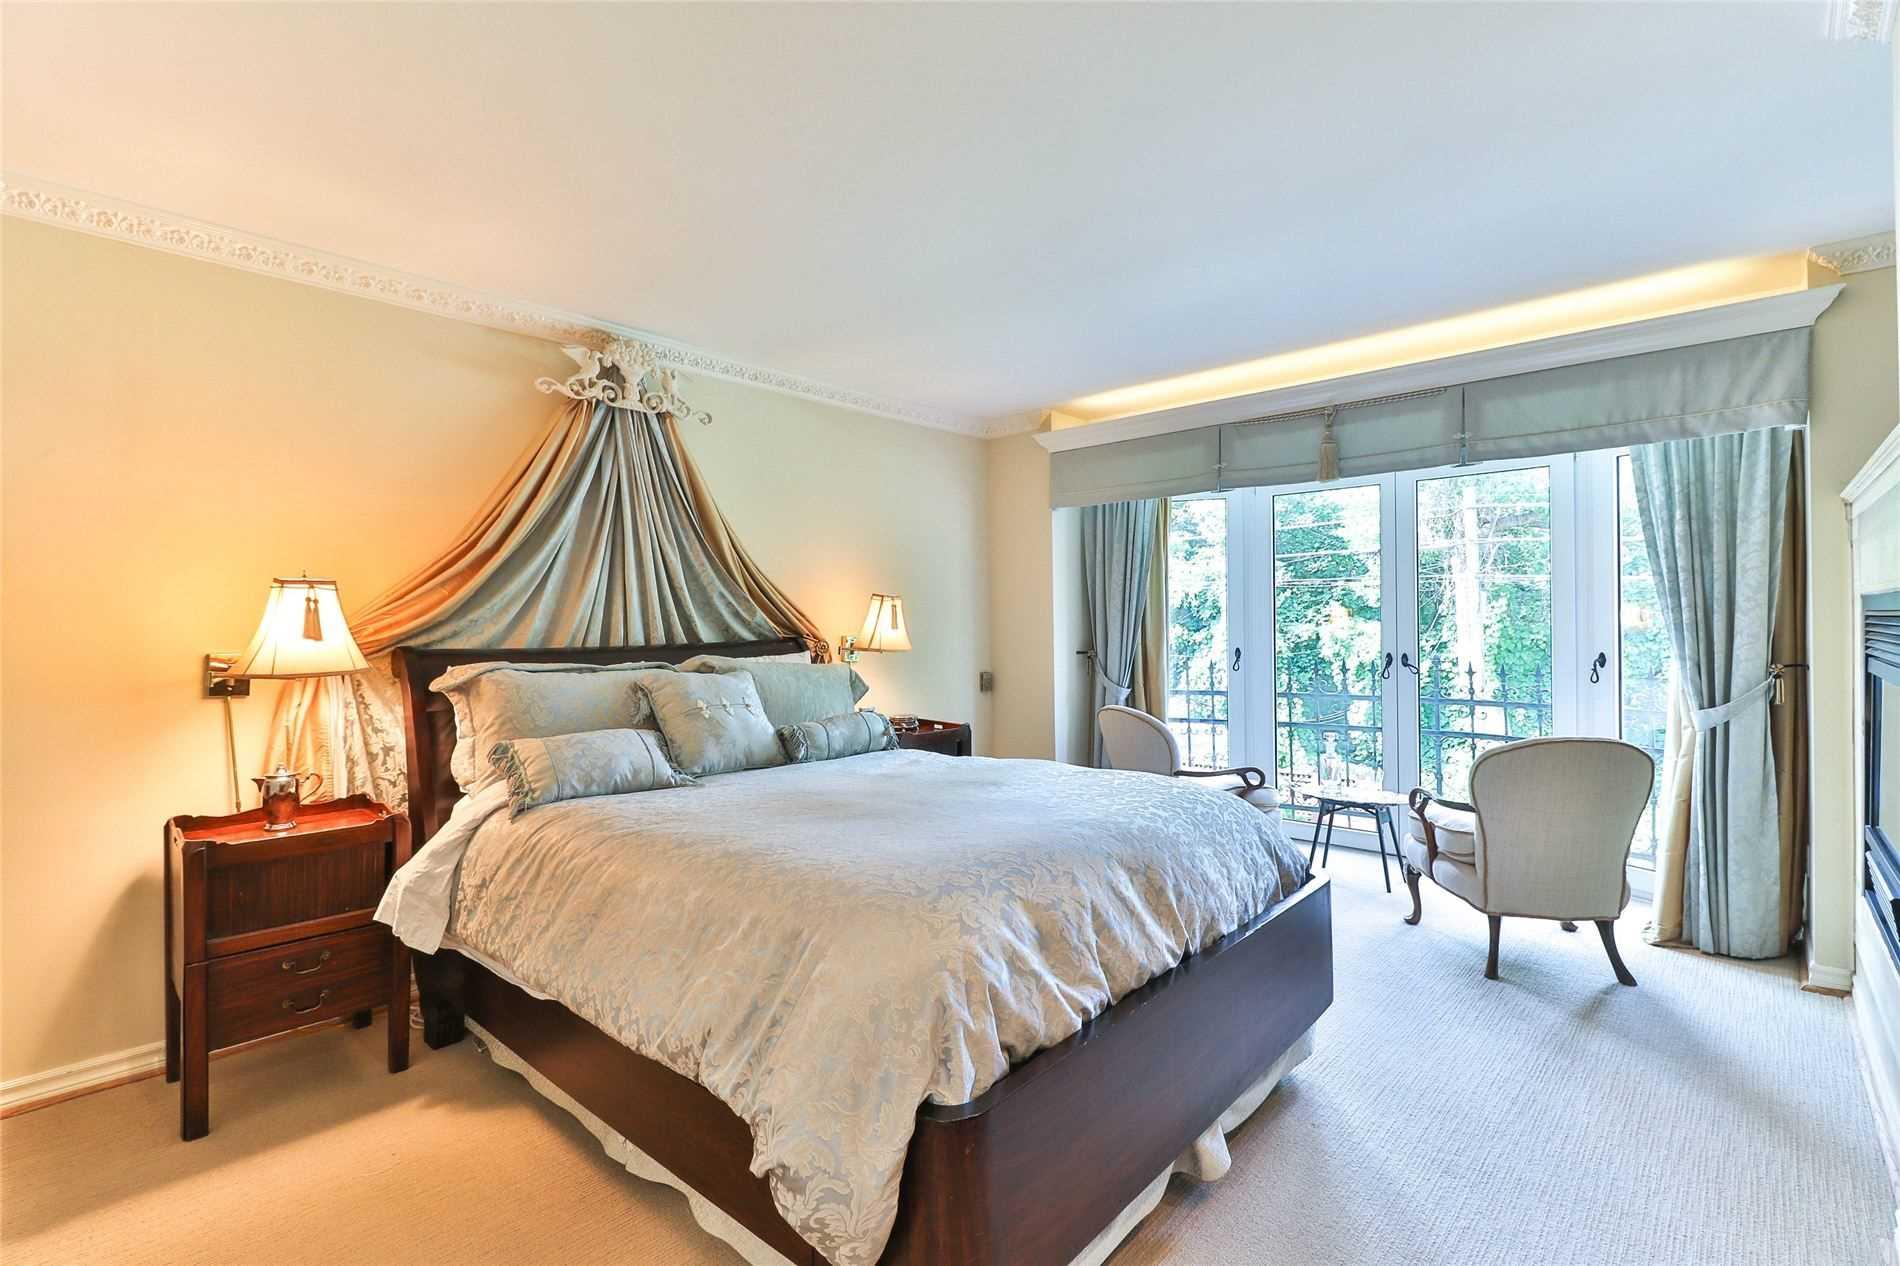 Att/row/twnhouse For Sale In Toronto , 2 Bedrooms Bedrooms, ,3 BathroomsBathrooms,Att/row/twnhouse,For Sale,Belmont